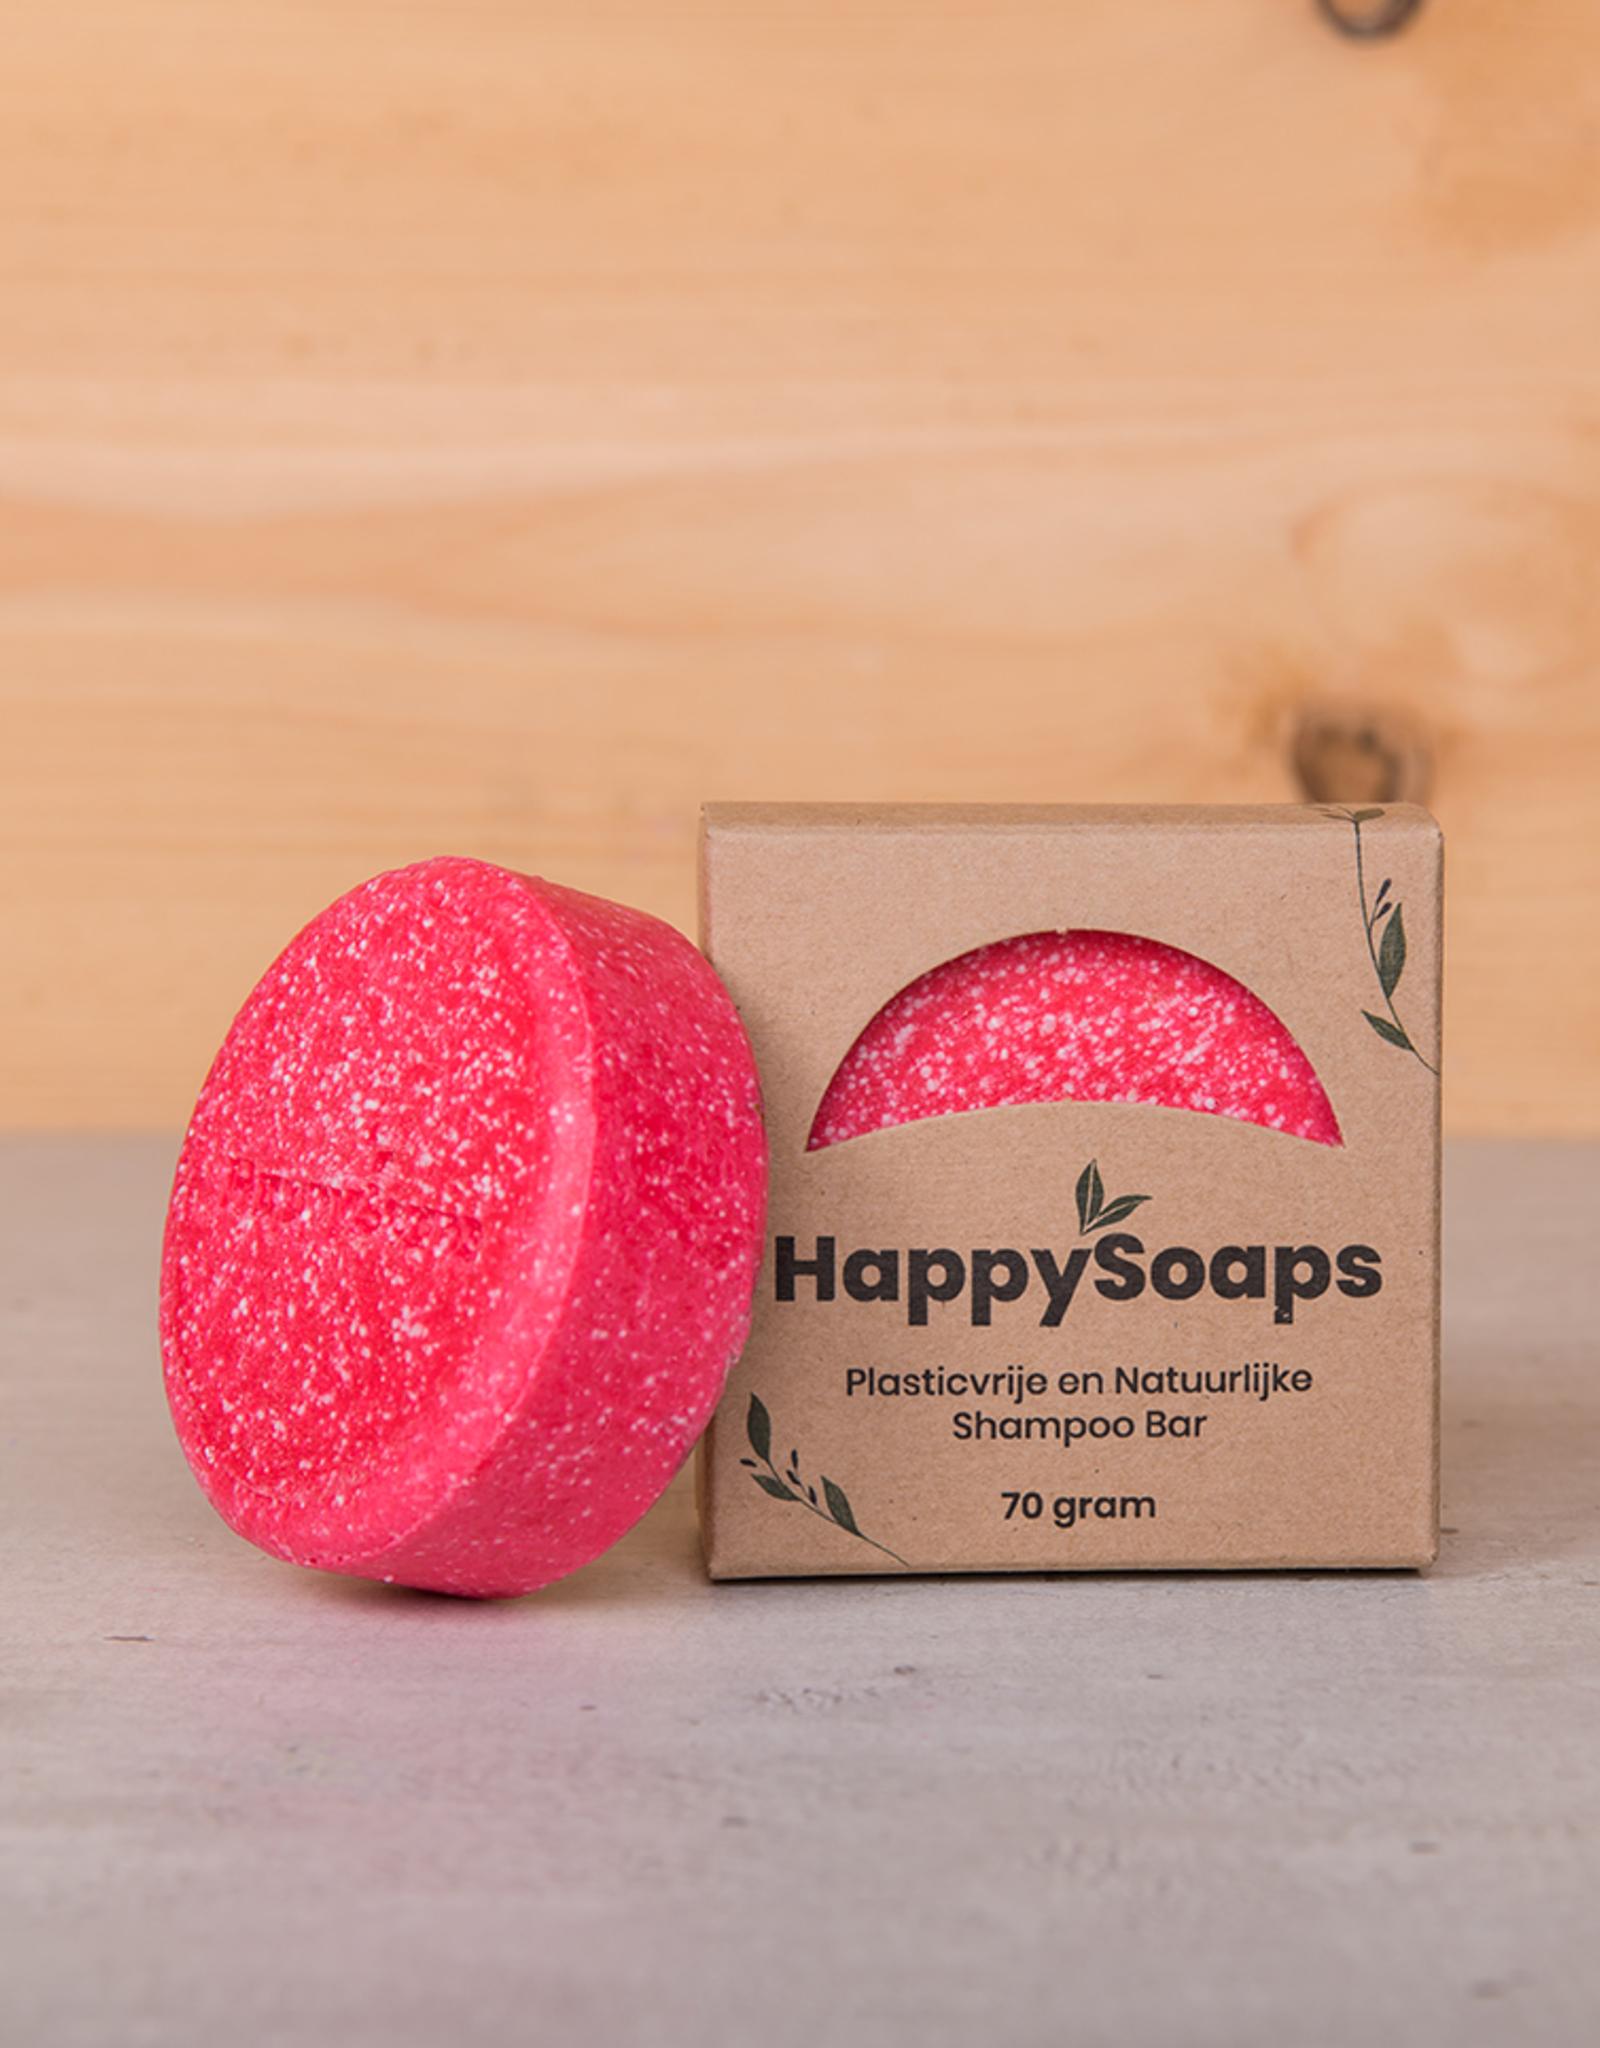 HappySoaps Cinnamon Roll Shampoo Bar 70gram - HappySoaps